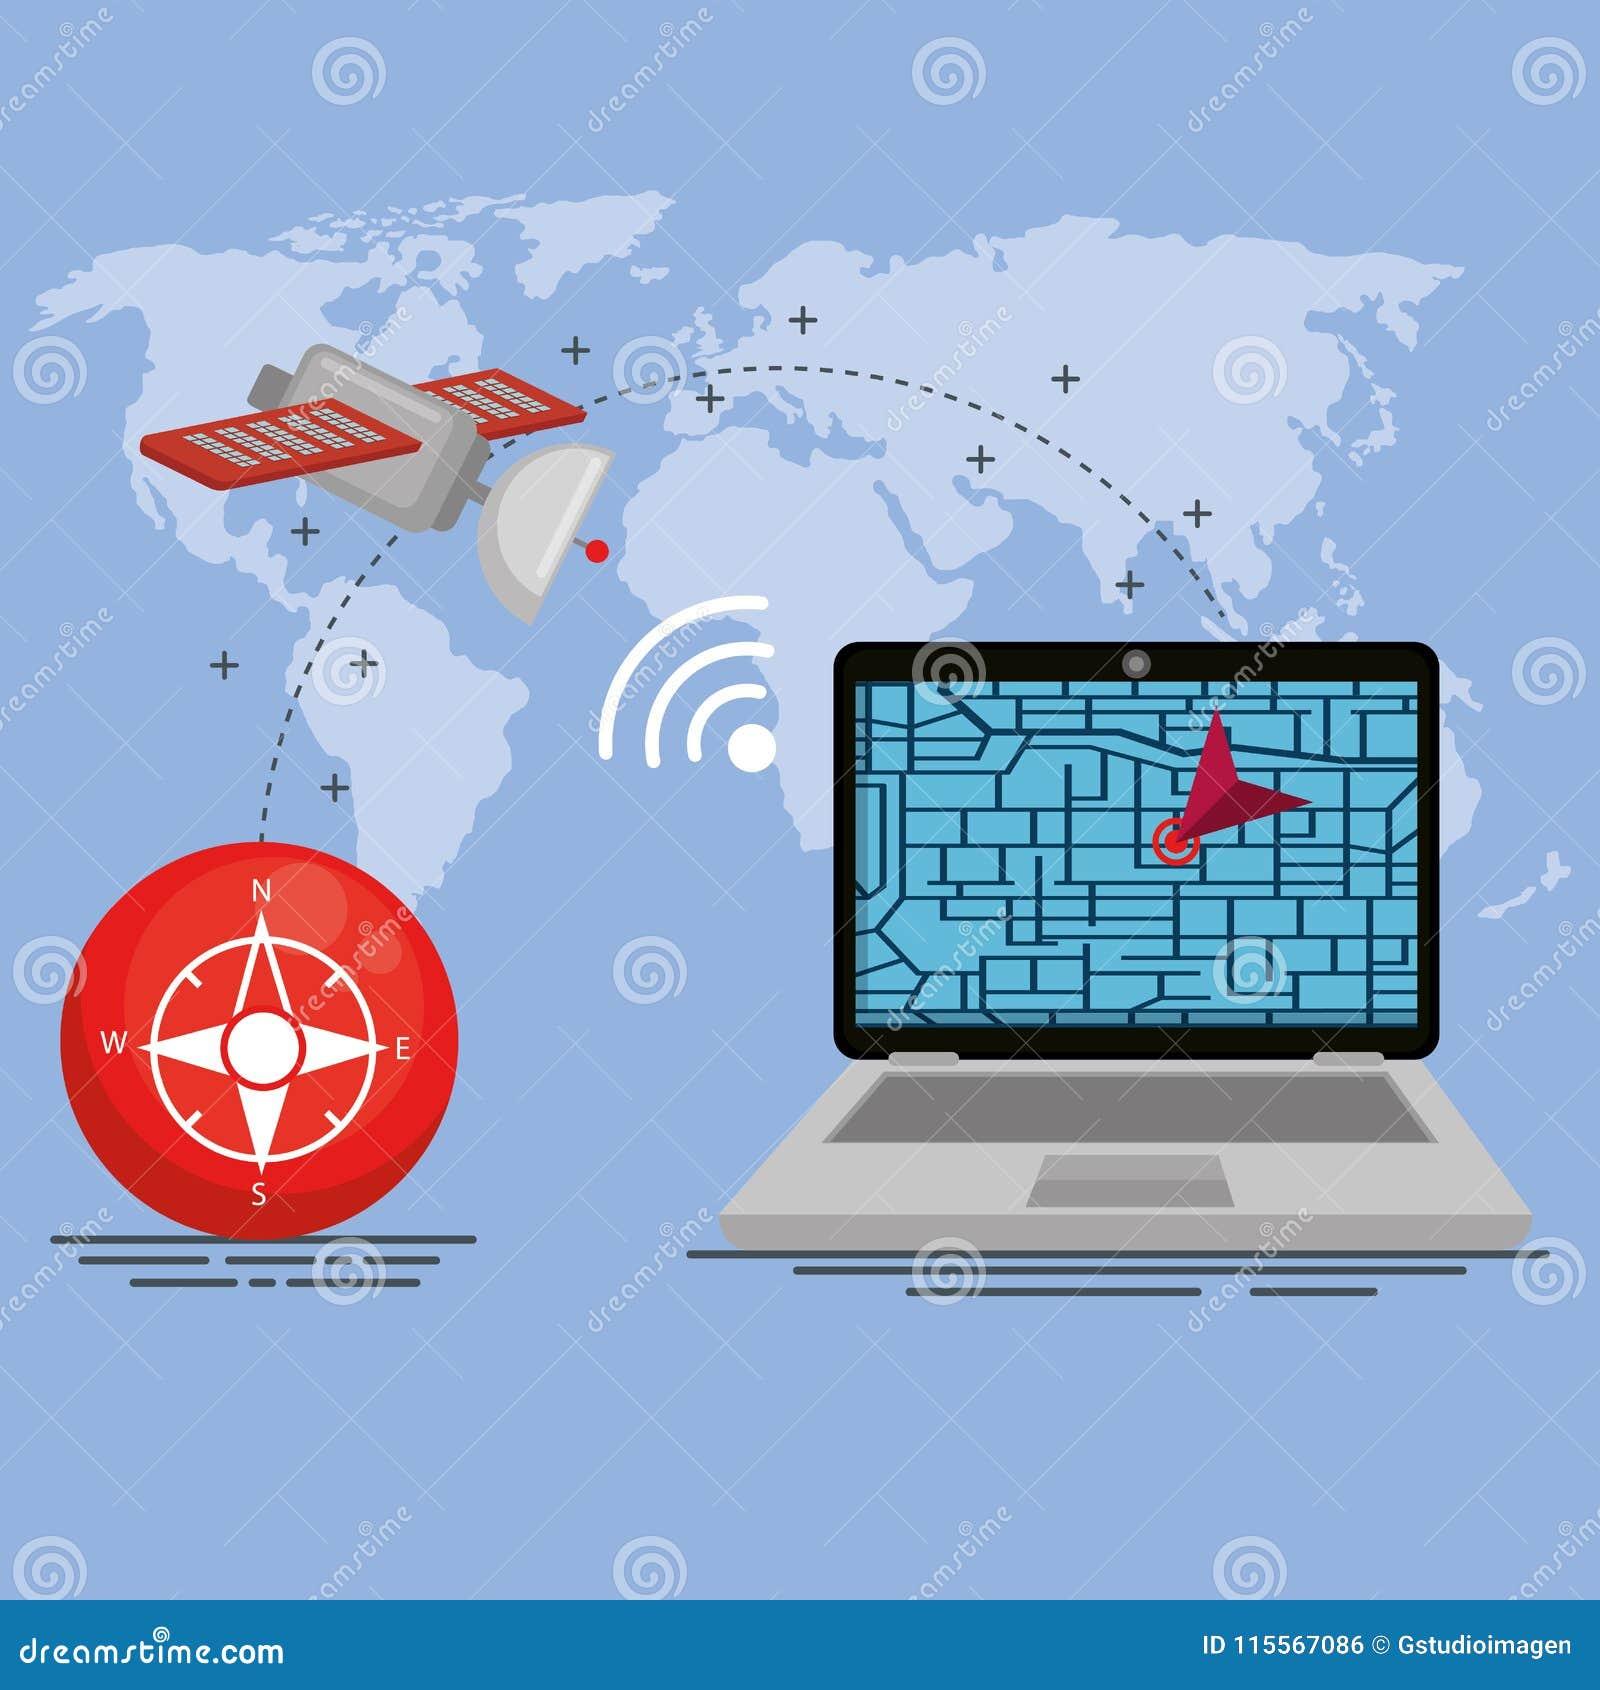 free download gps navigation software for laptop